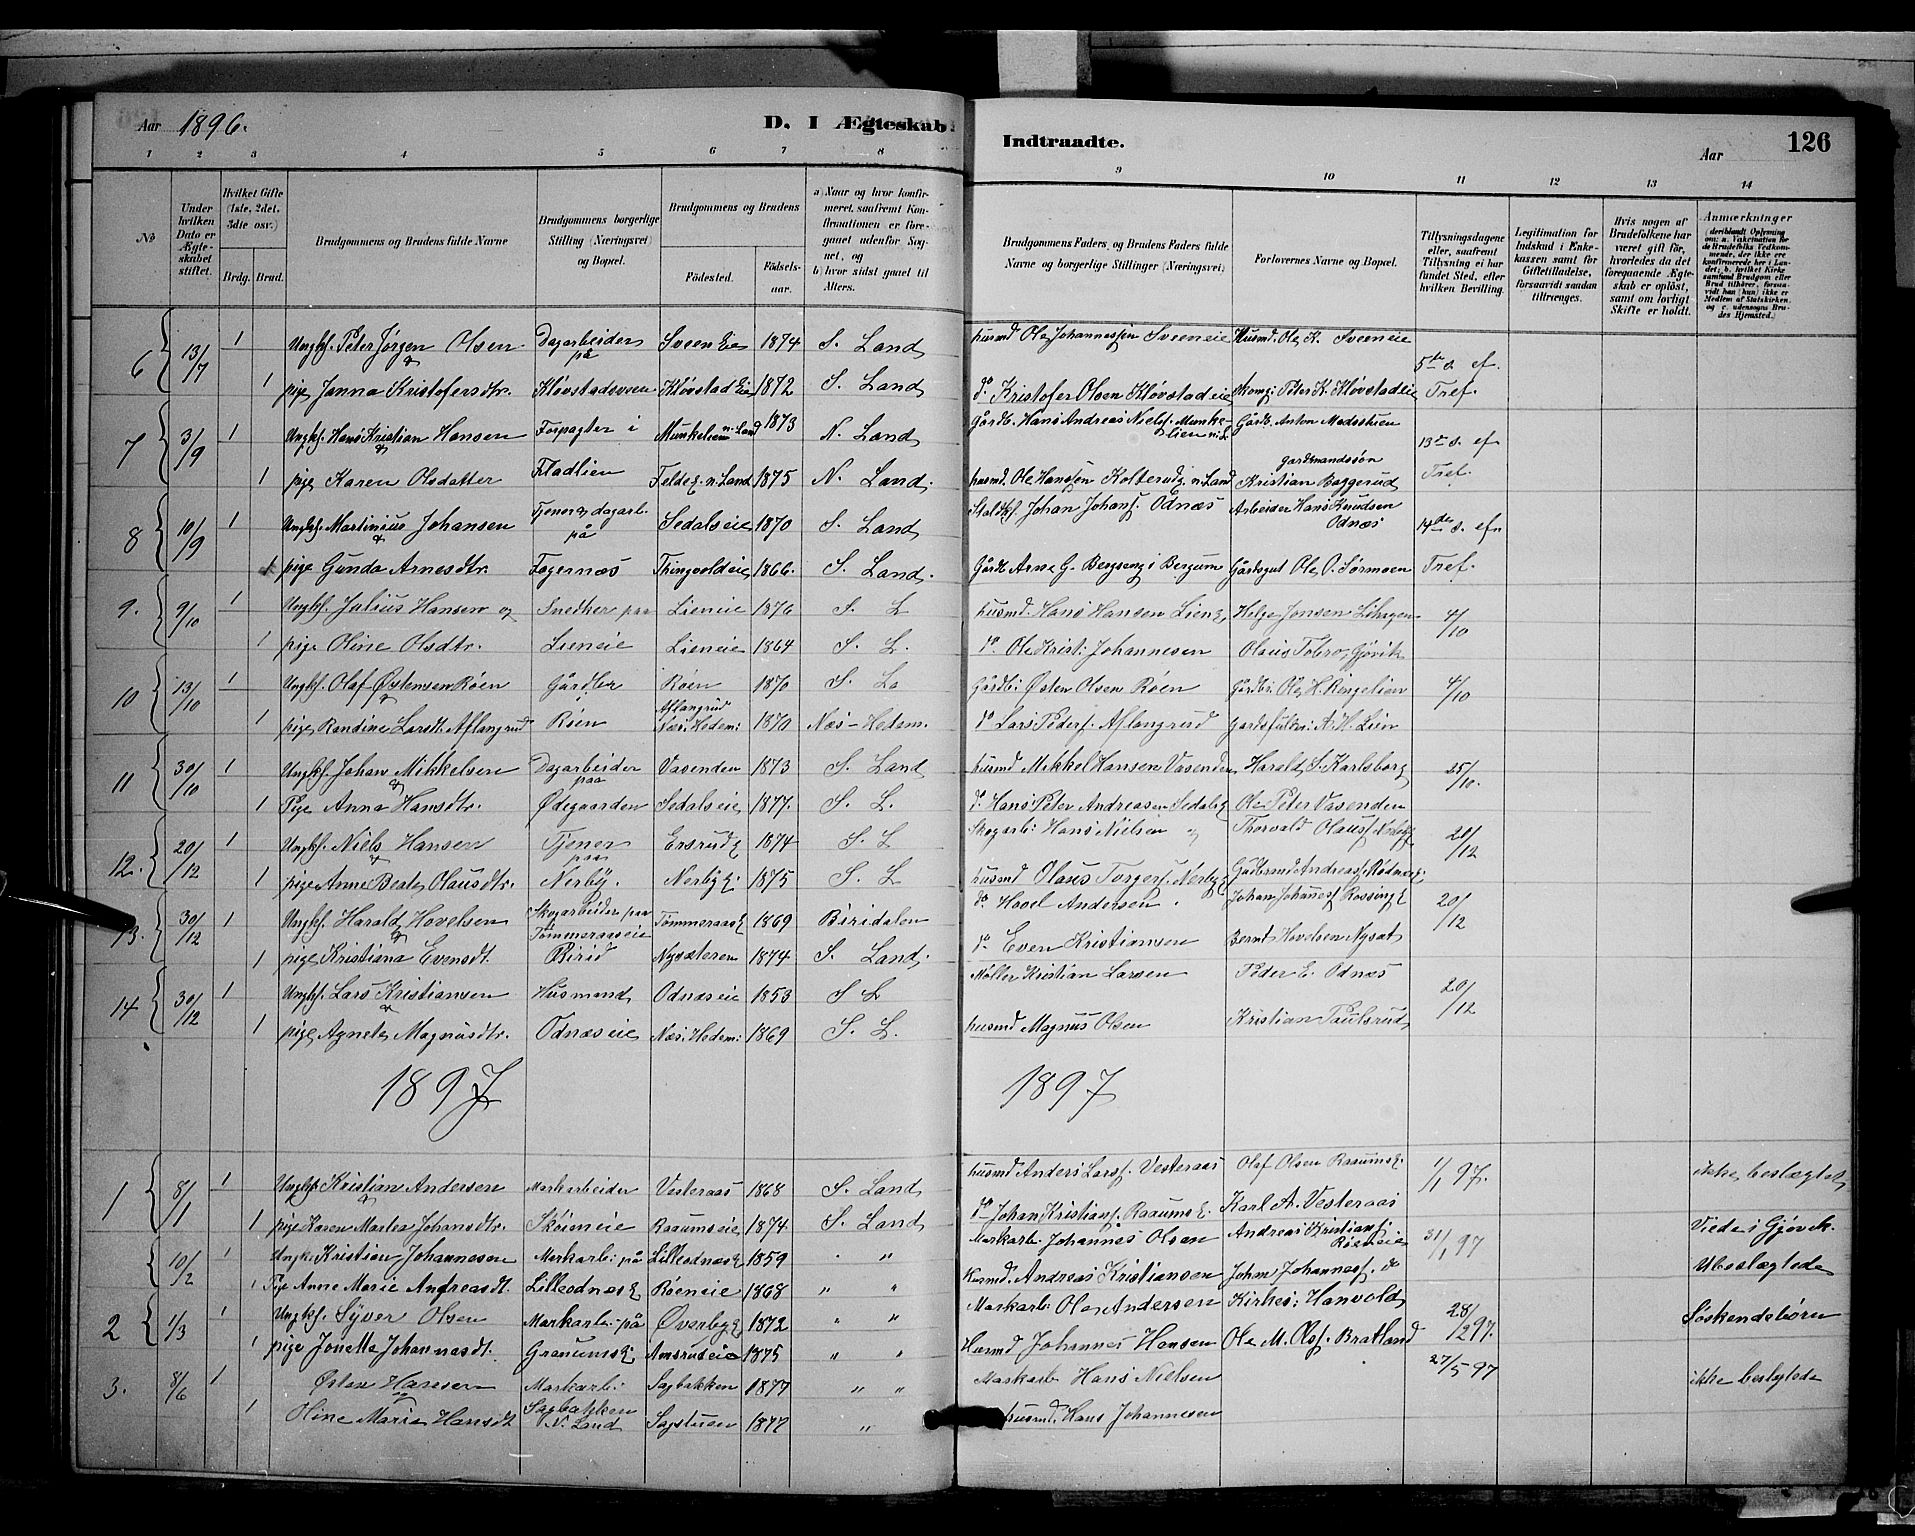 SAH, Søndre Land prestekontor, L/L0003: Klokkerbok nr. 3, 1884-1902, s. 126